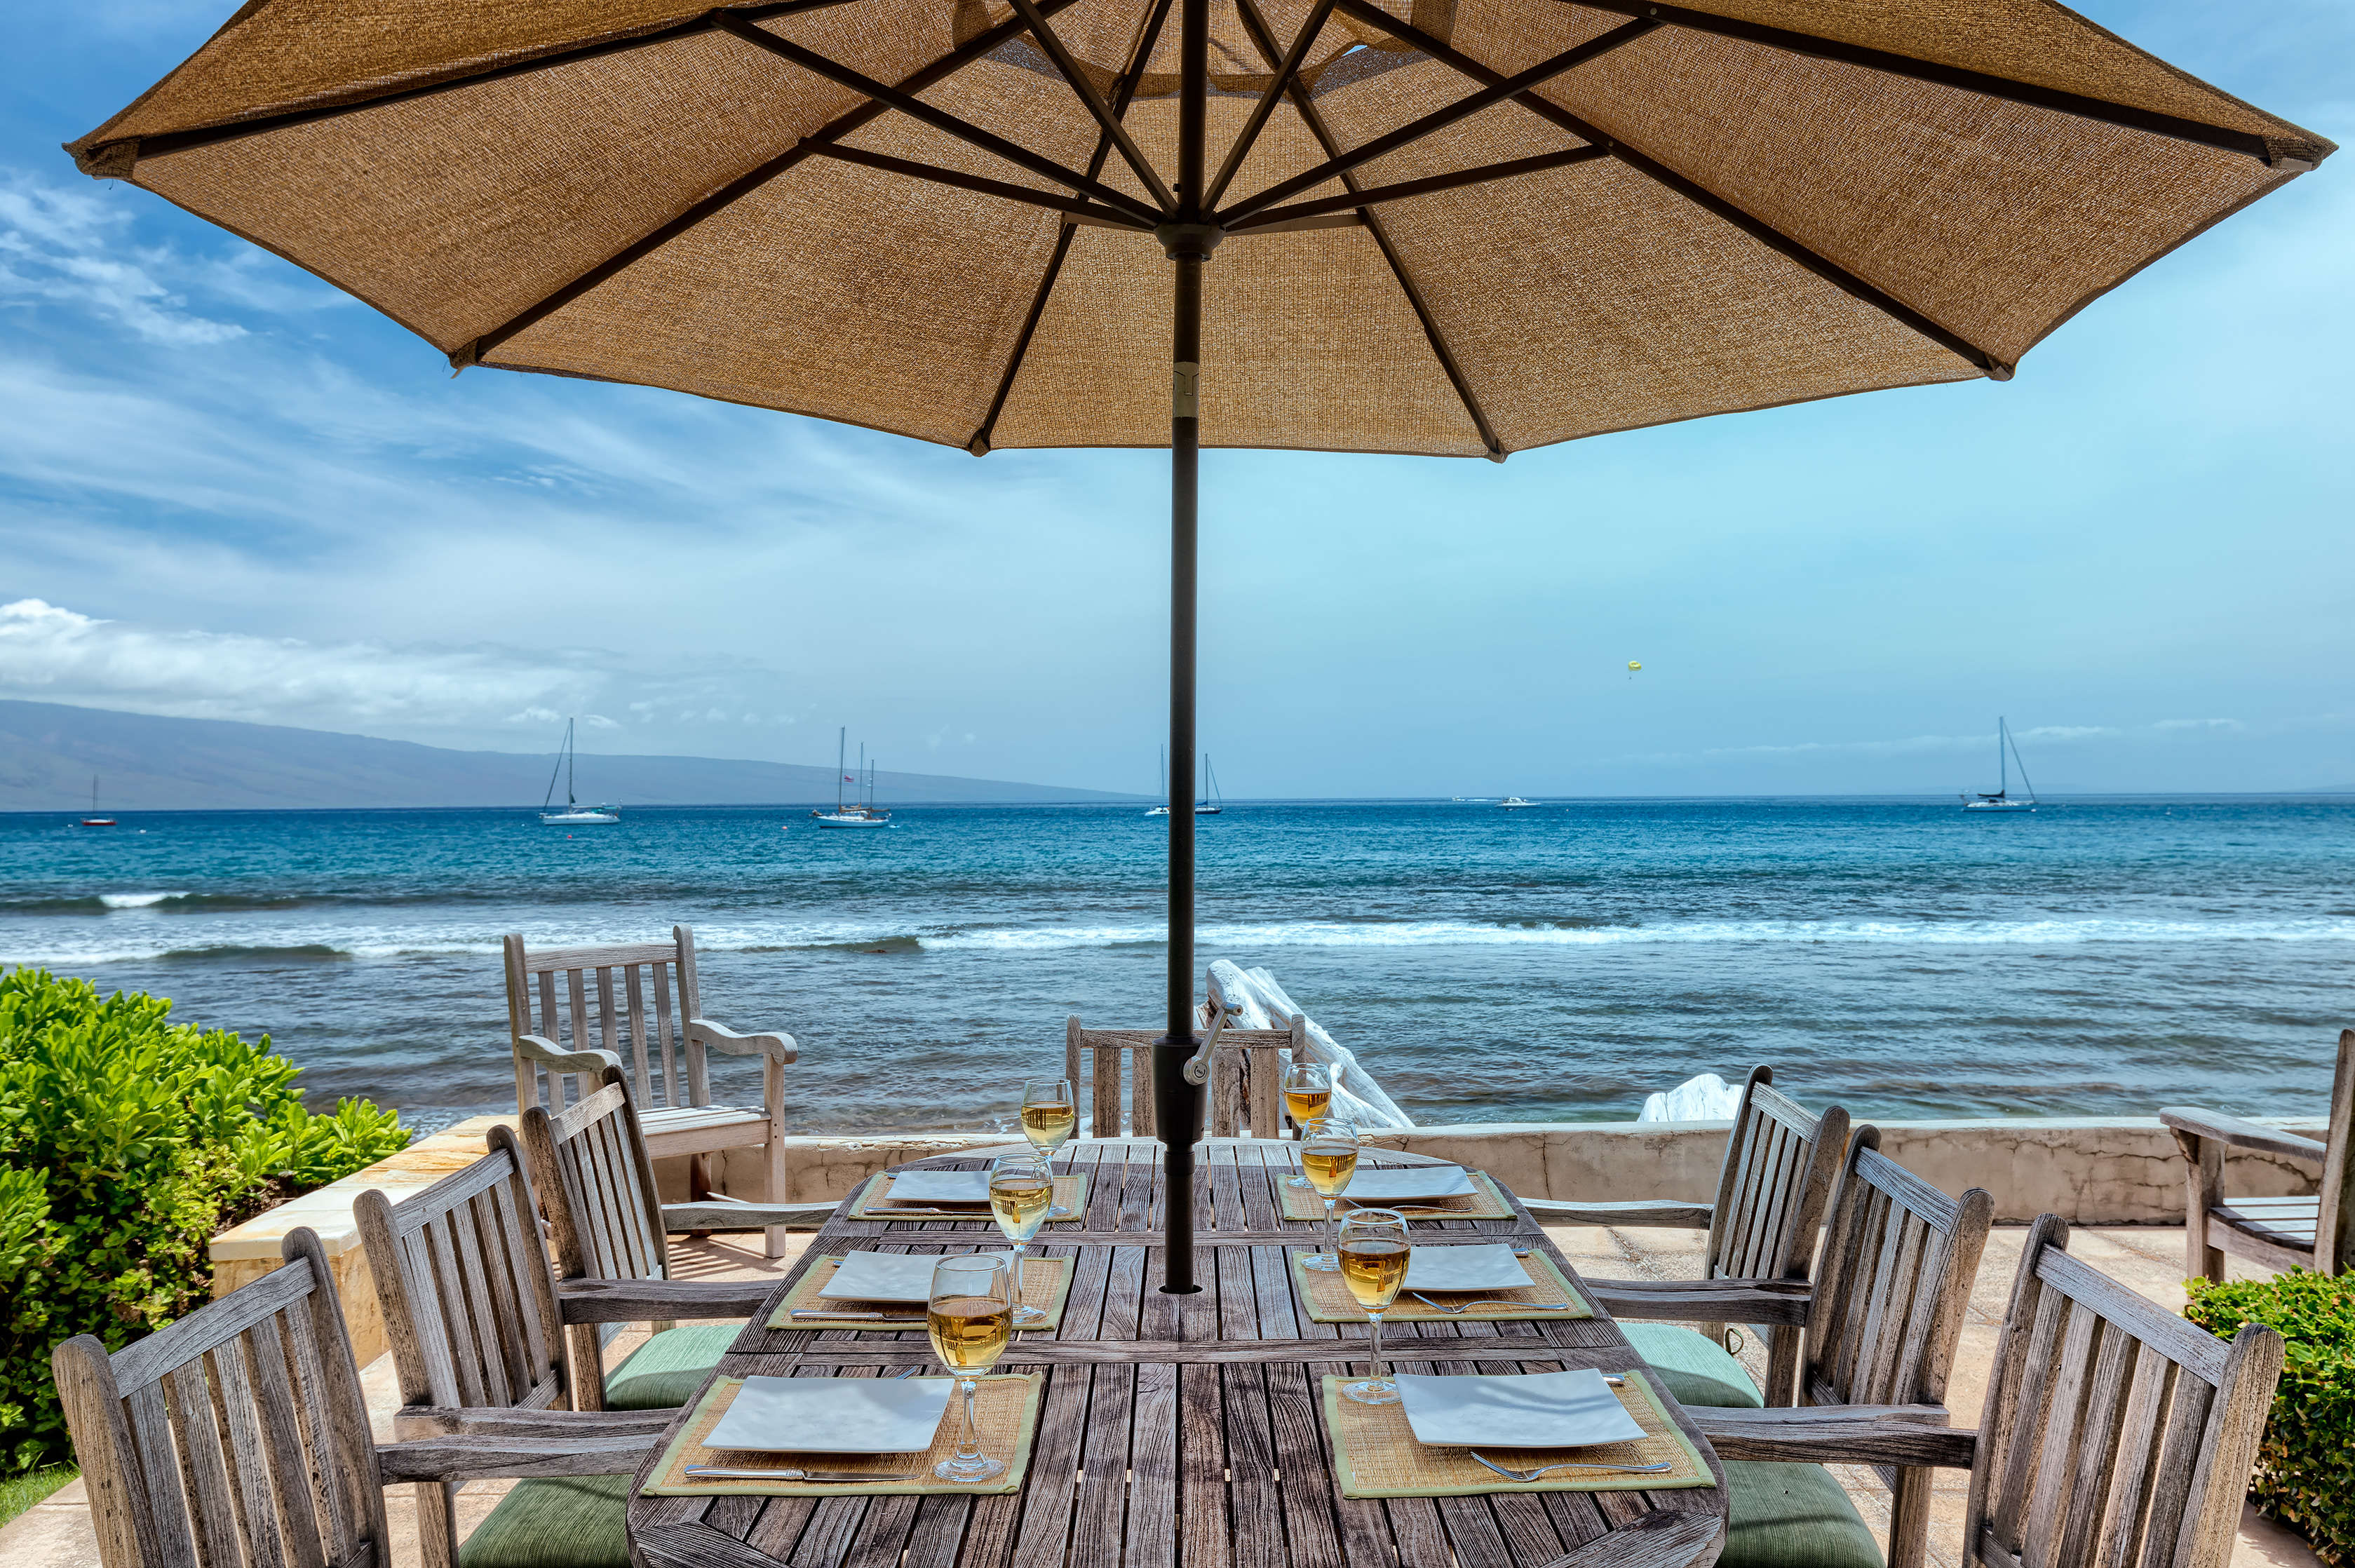 Luxury vacation rentals usa - Hawaii - Maui - Lahaina - Villa Turtle Beach - Image 1/40